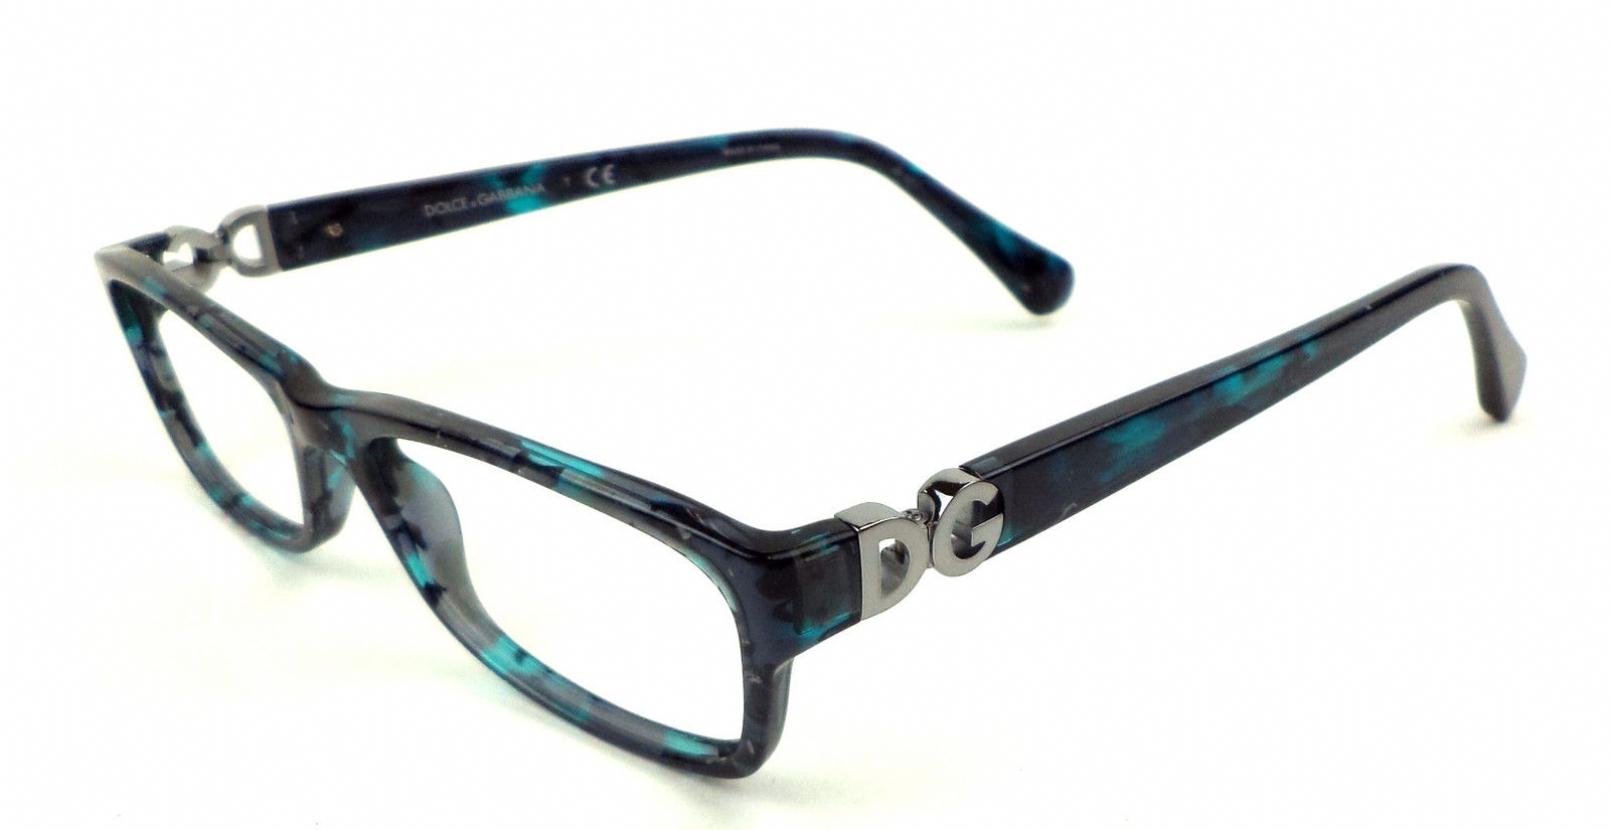 dolce and gabbana rimless bottom eyeglasses blue www